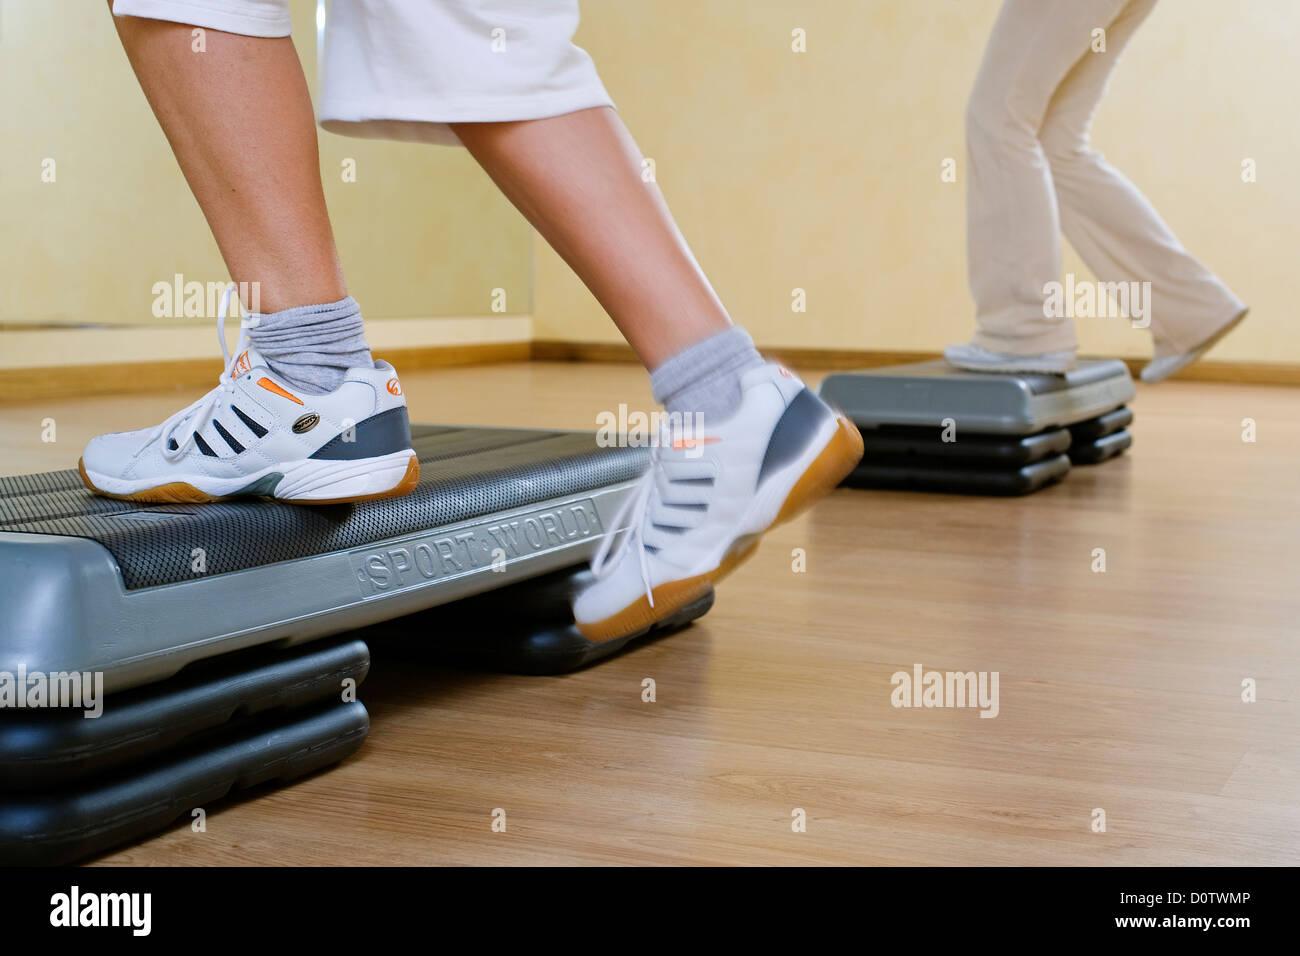 Gim Albayt Resort and Spa Wellness Center Estepona Malaga Andalusia Spain - Stock Image